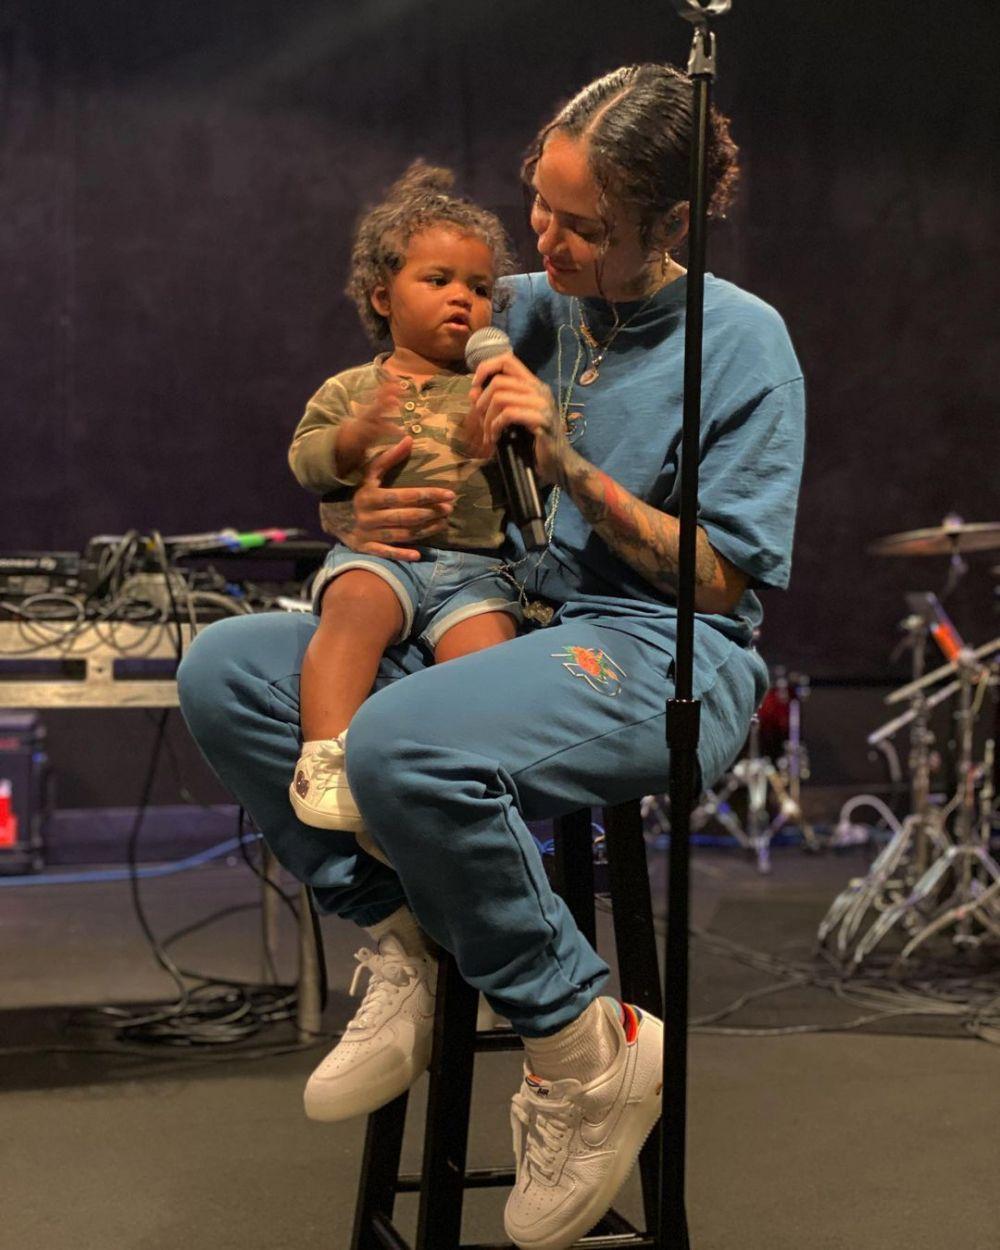 Sudah Jadi Ibu, 10 Potret Manis Kehlani Bersama Baby Adeya